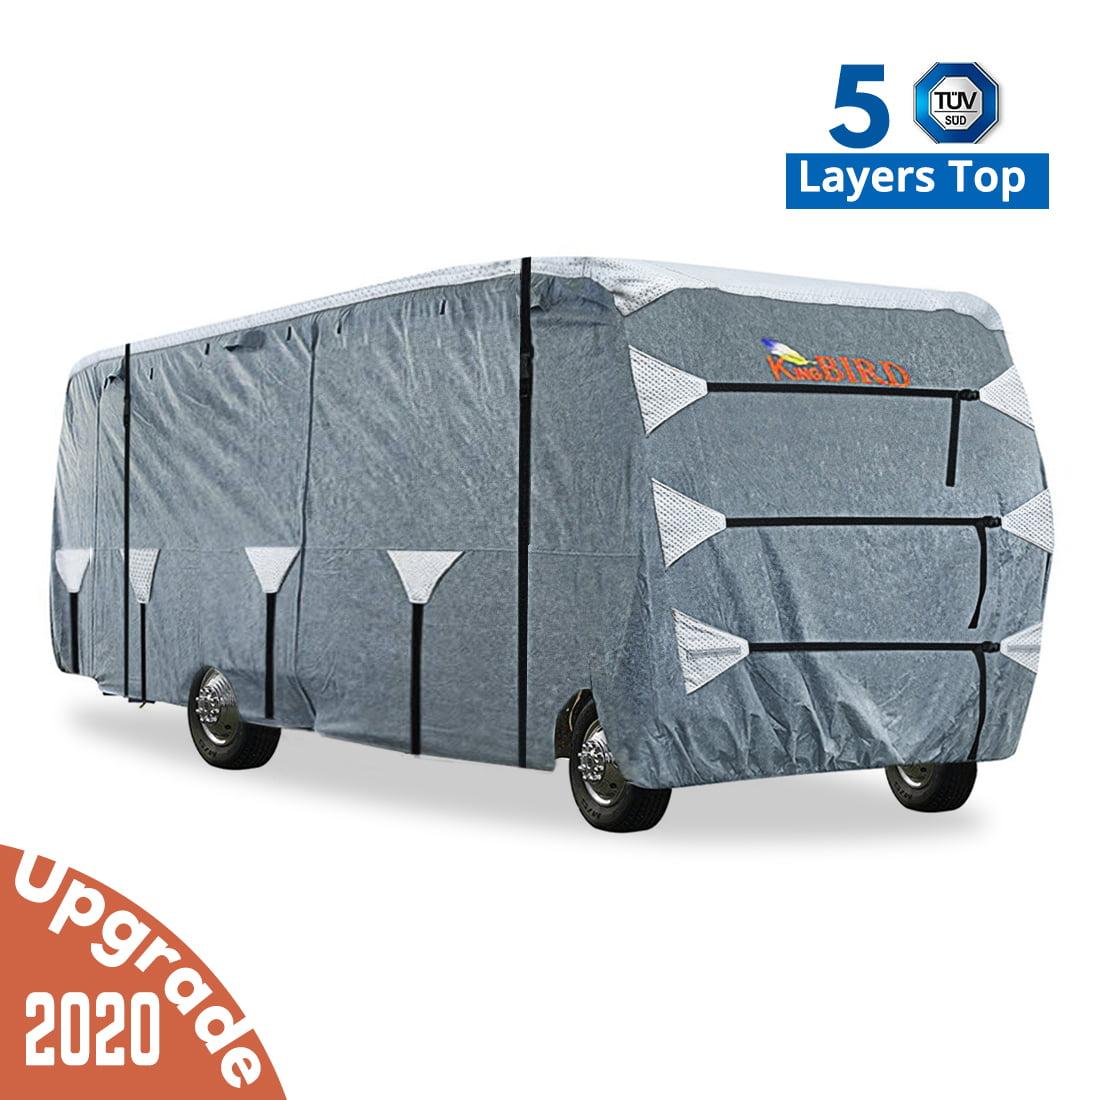 Coverking RVCC34P62 Universal Fit RV Cover Class C Length 32 ft Presidium, Grey to 34 ft.-